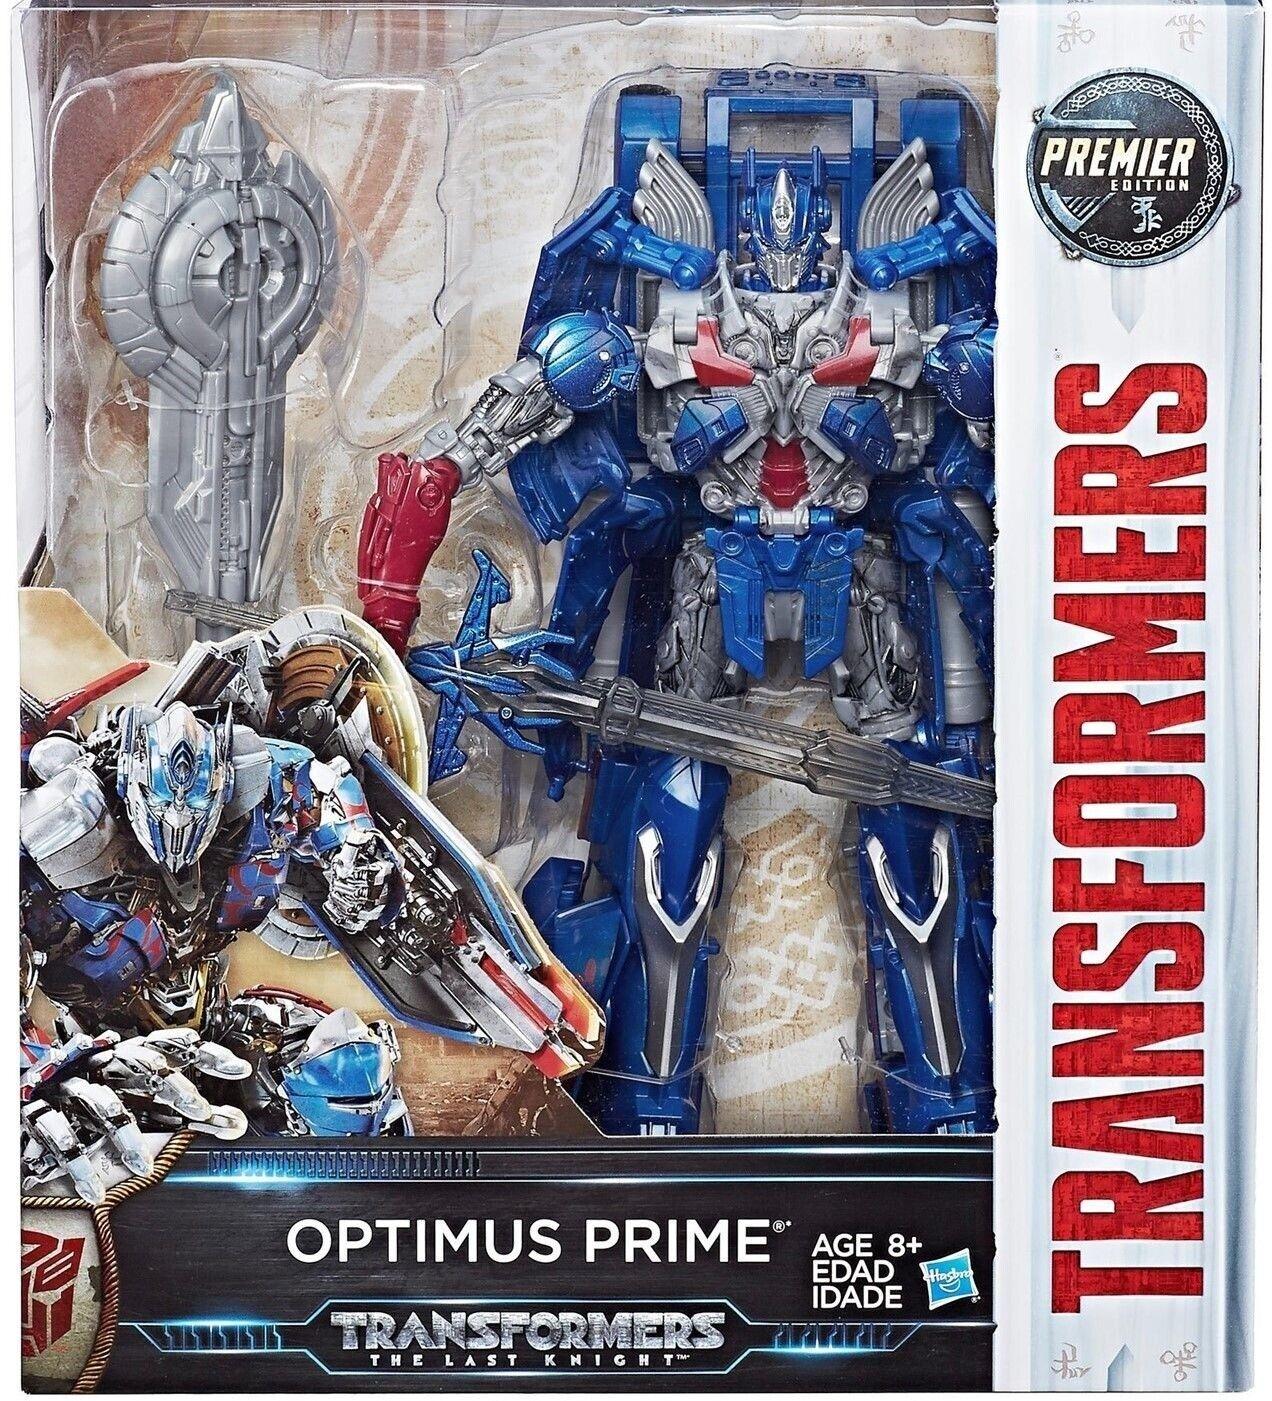 Hasbro Transformer Last Knight OPTIMUS PRIME Premier Edition Leader Class Figure